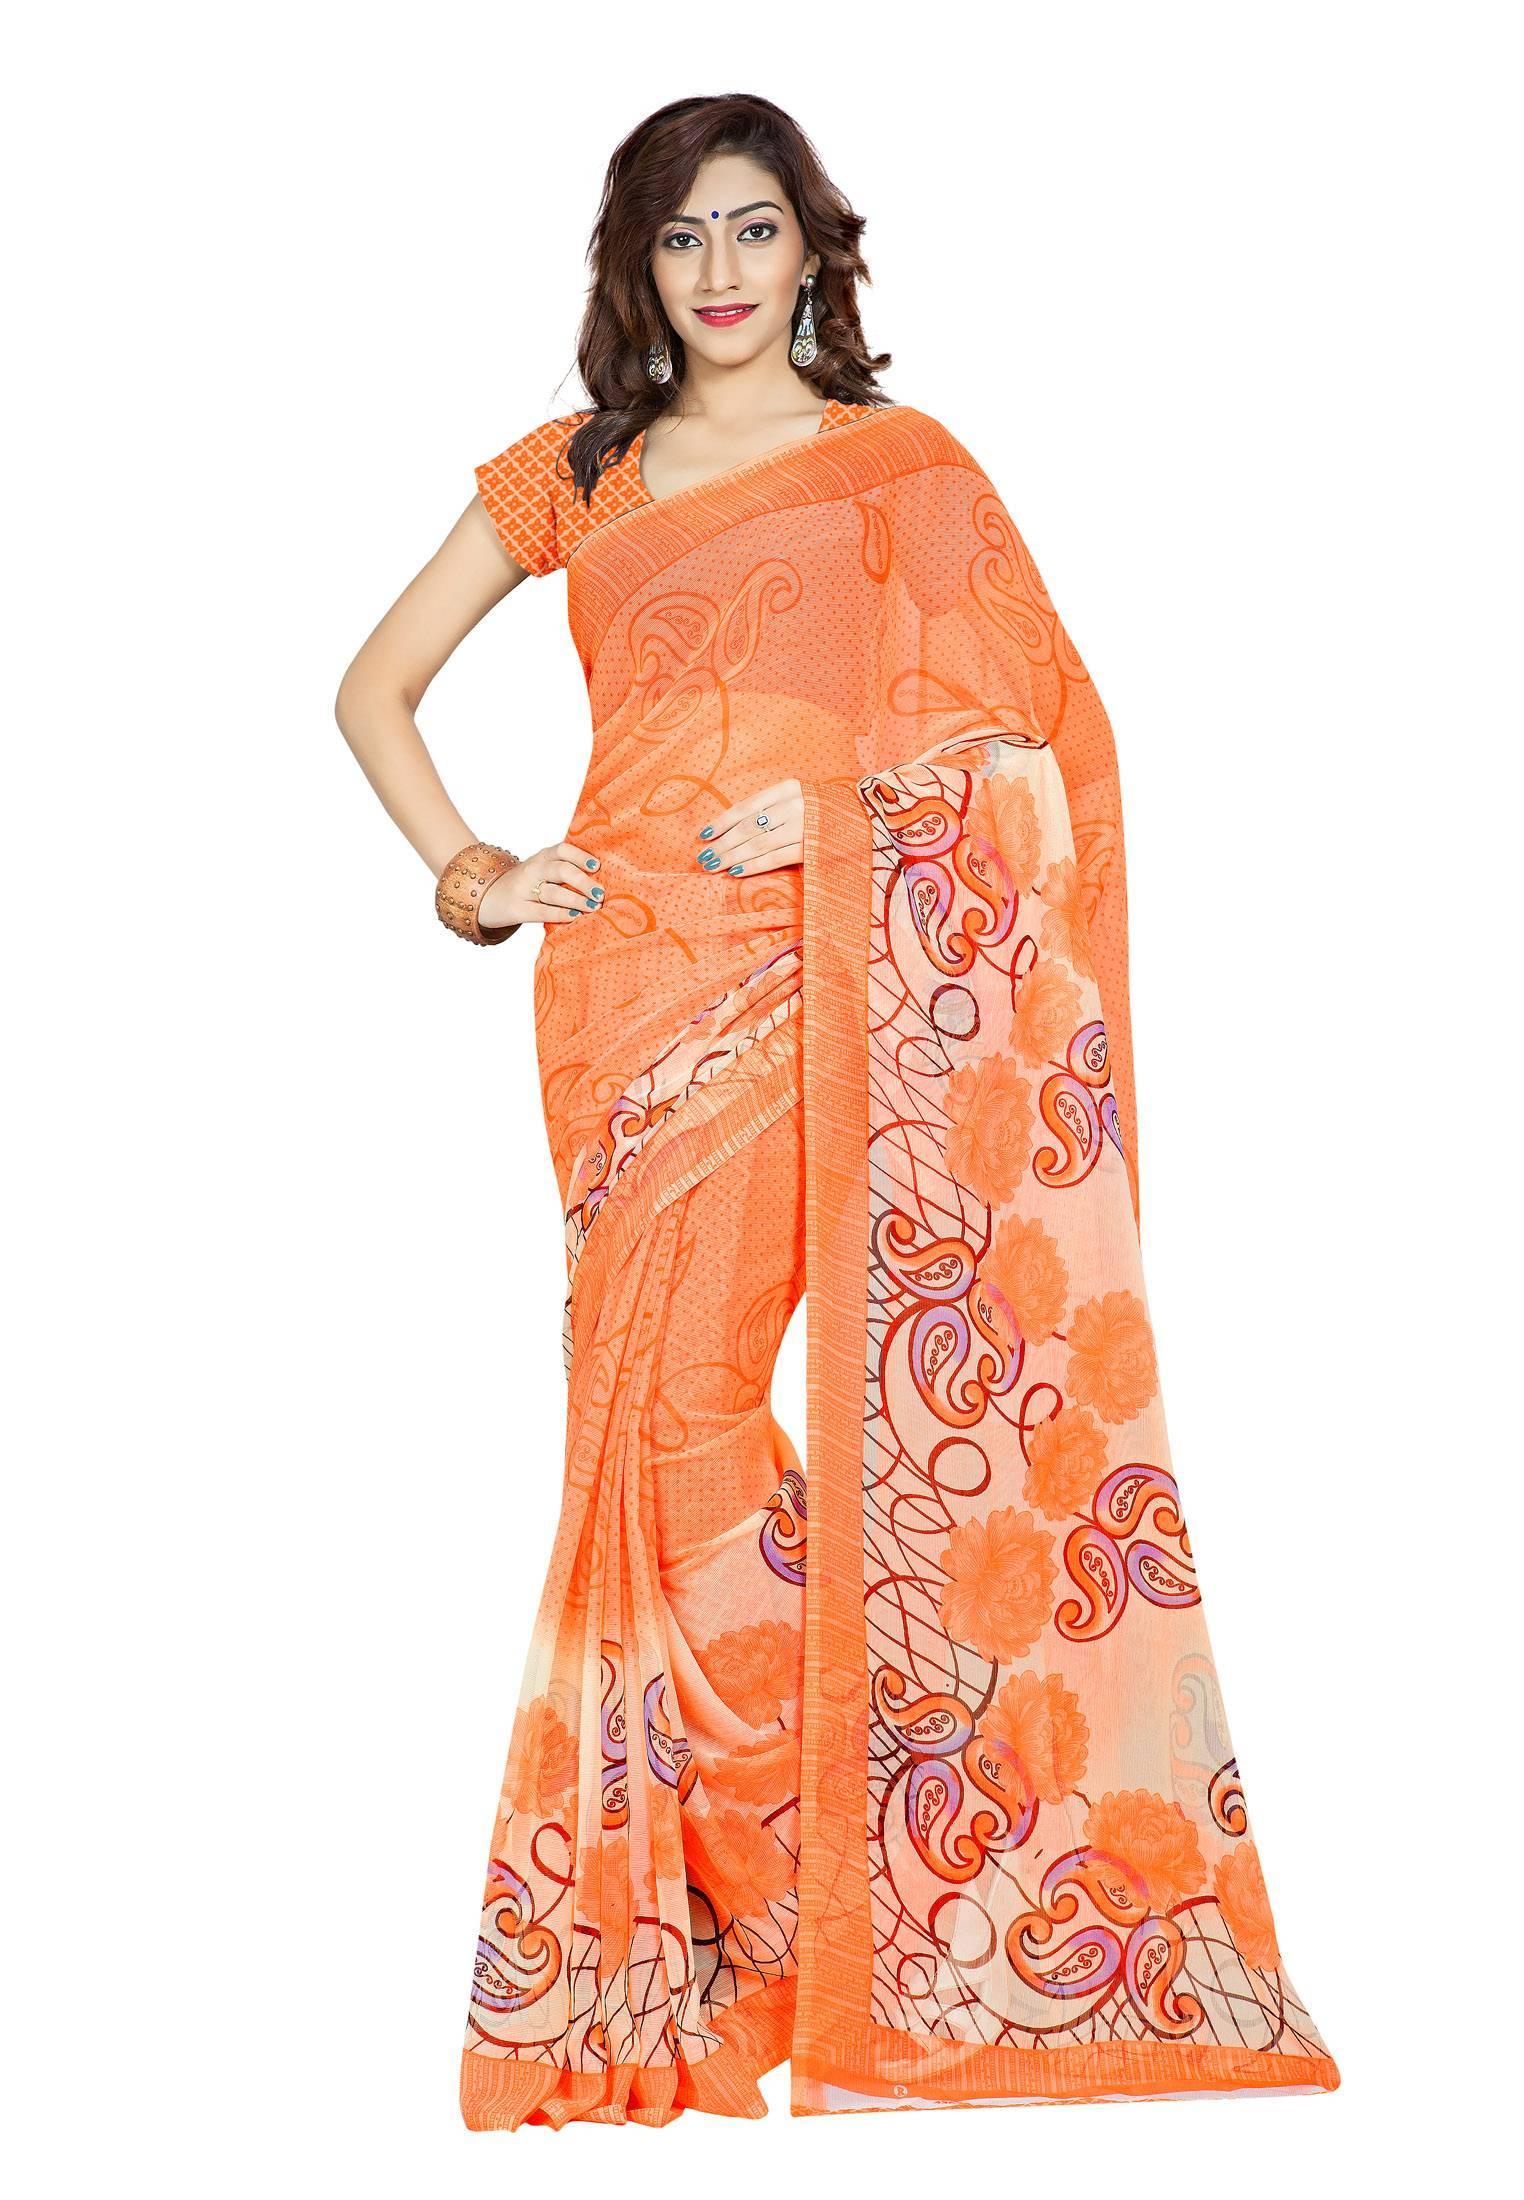 Ambaji Casual Wear Orange Colored Printed Chiffon Saree/Sari